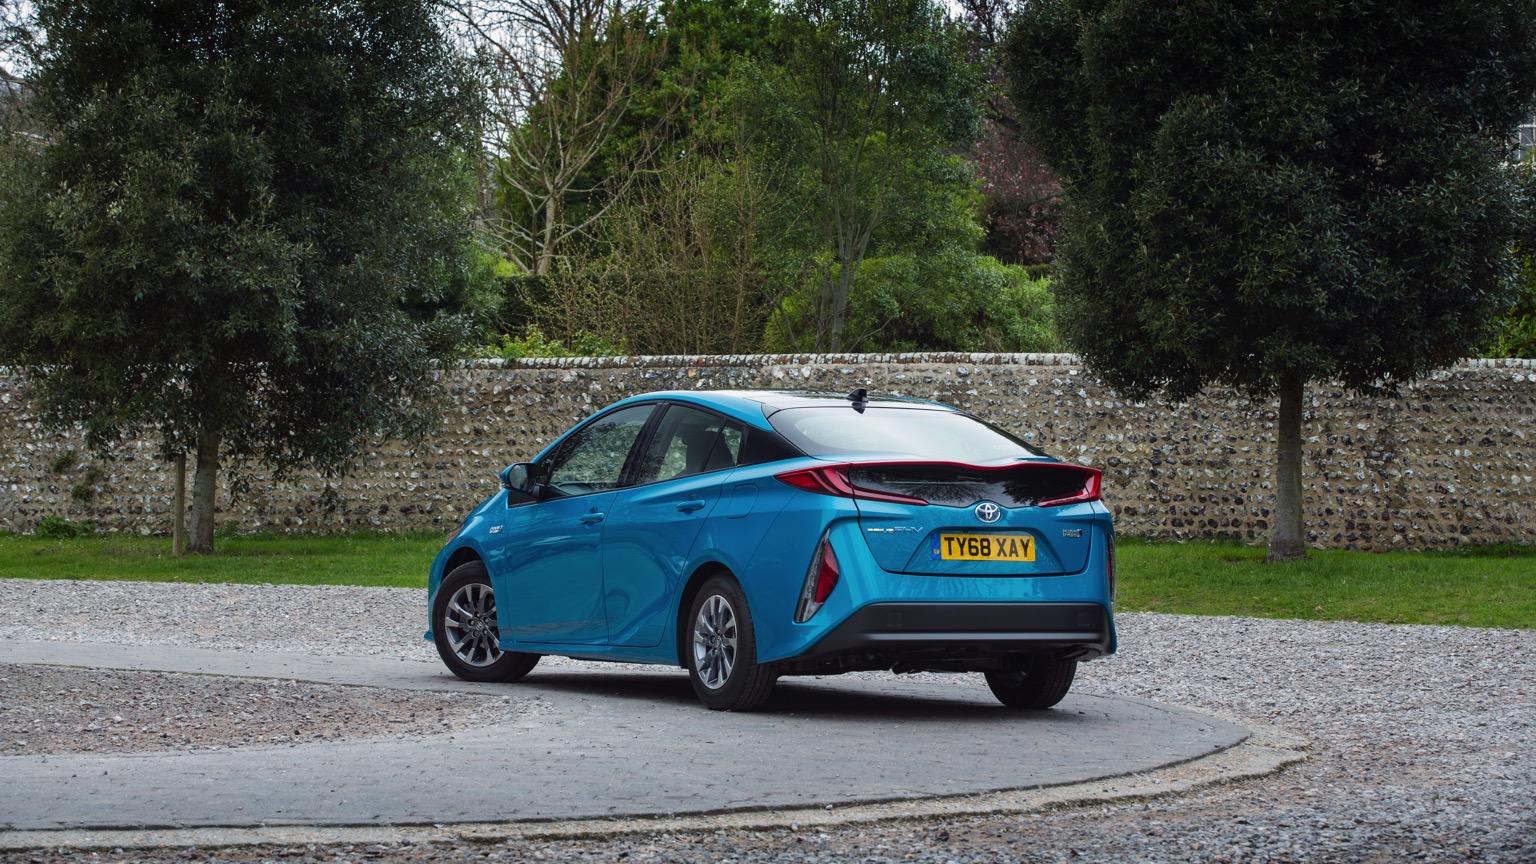 Toyota_Prius_Plug-in_Hybrid-2019-02@2x